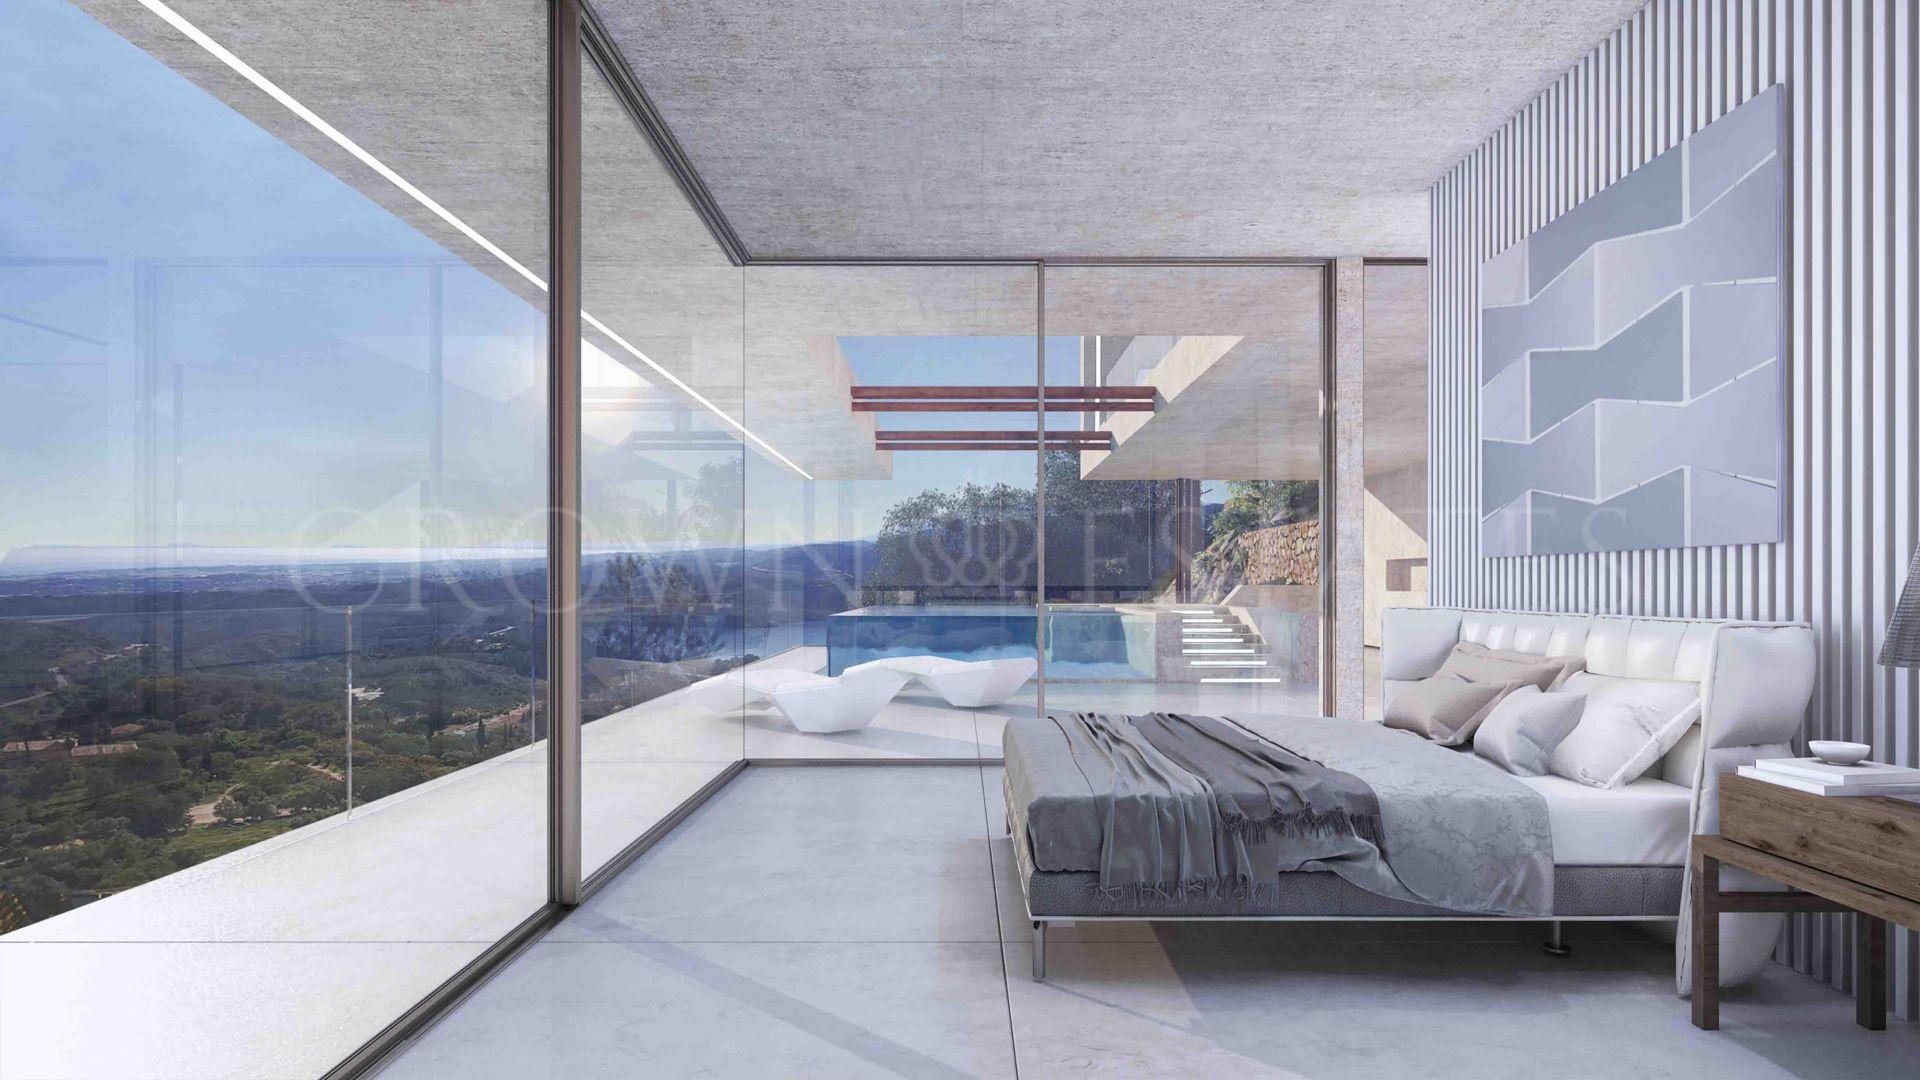 Brand new villa with breathtaking sea views